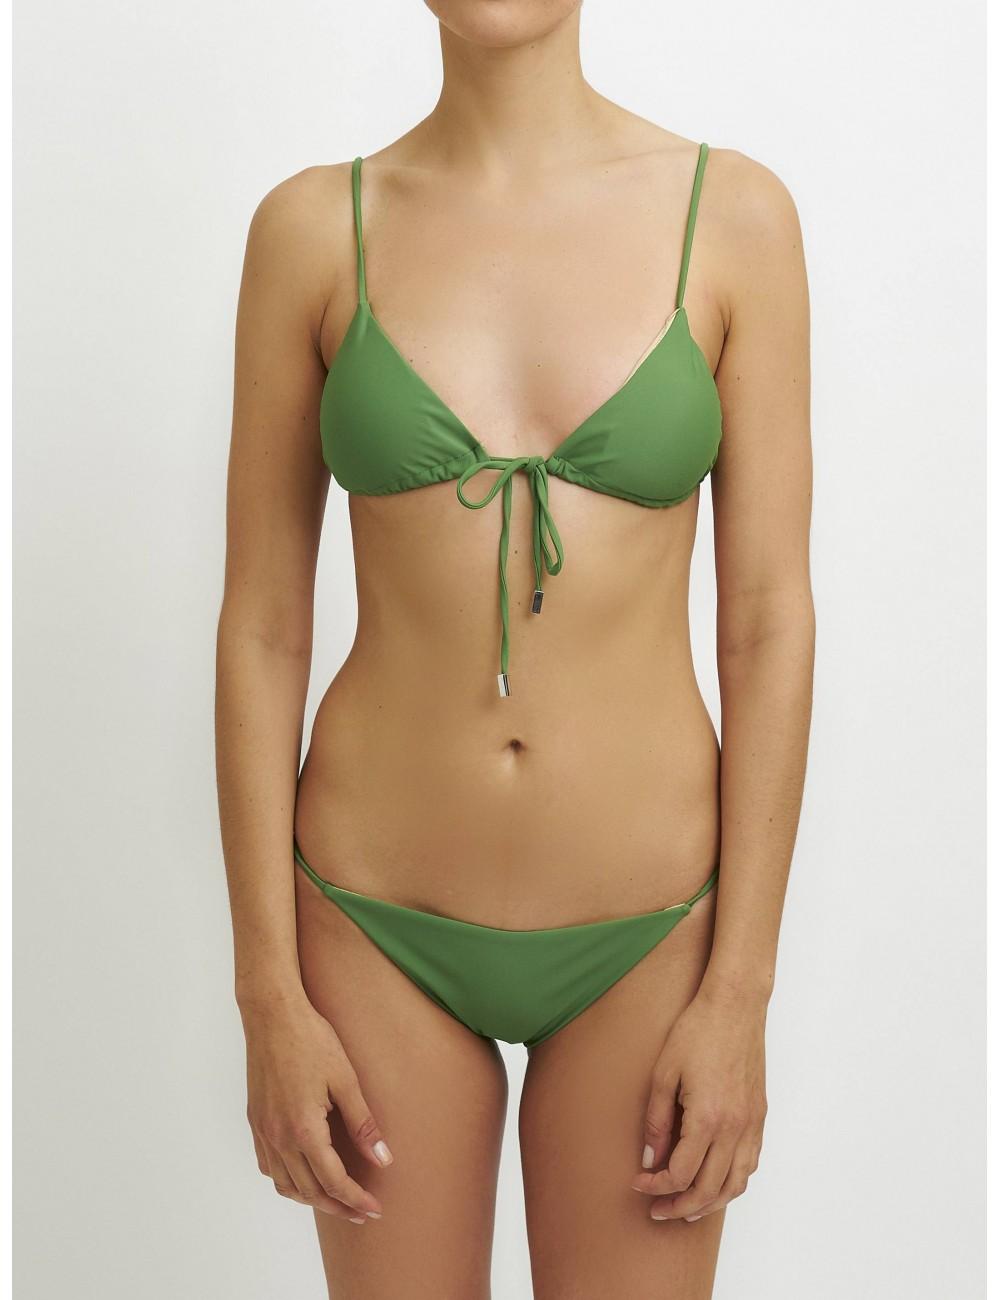 Bikini Triangulo Bikini Bikini Sujetador Triangulo Sujetador Sujetador 9DWEHI2